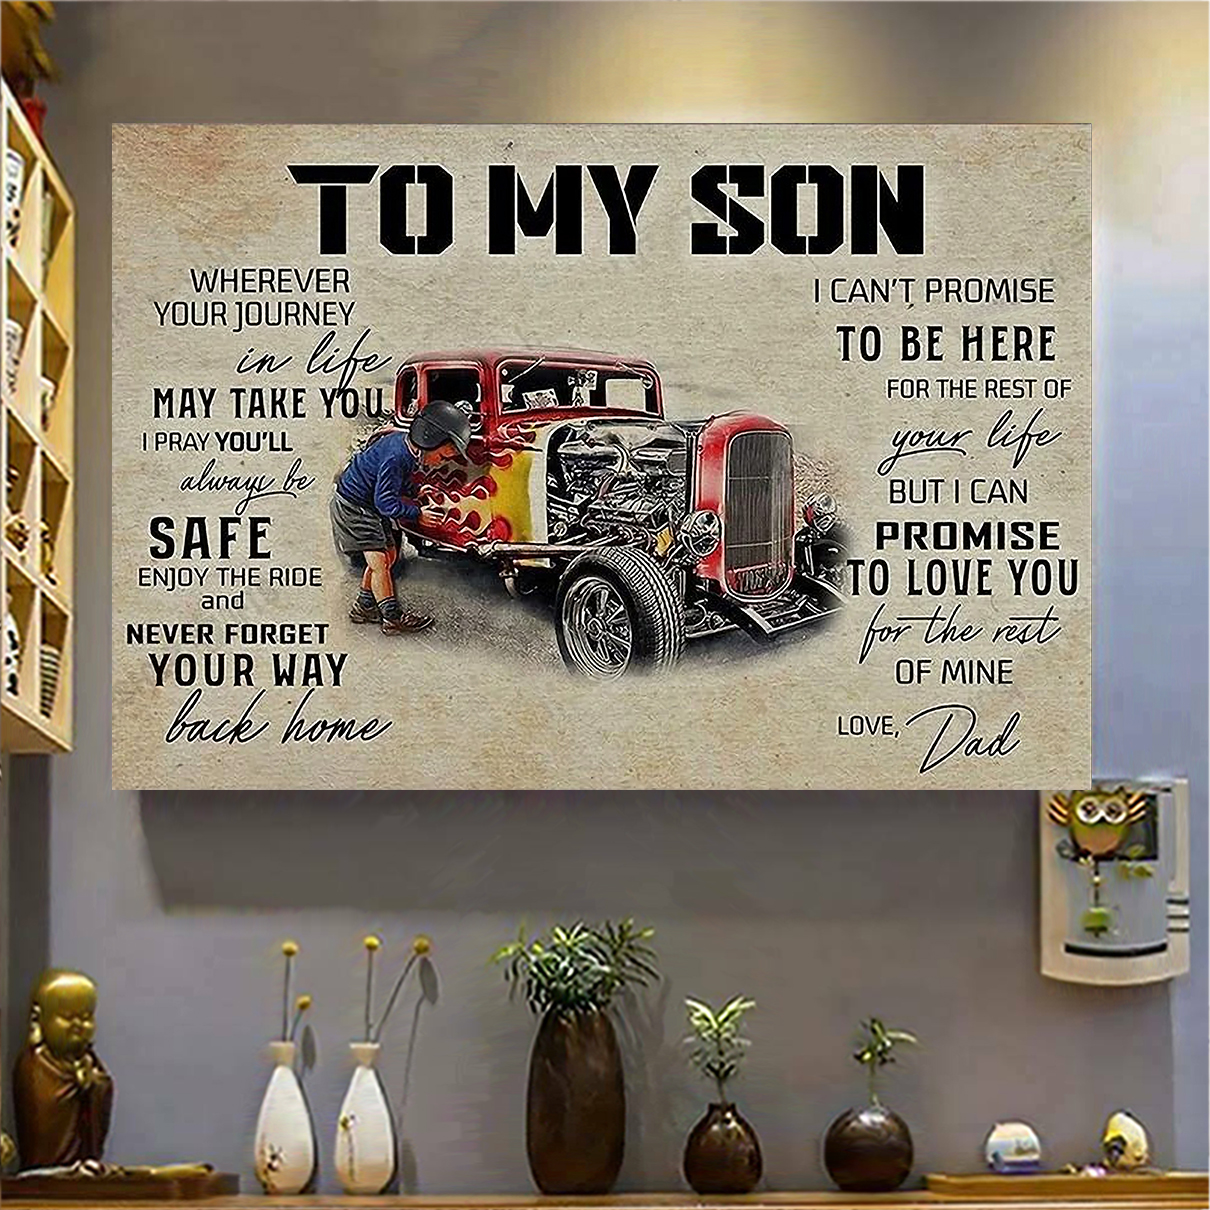 Hot rod to my son love dad canvas medium